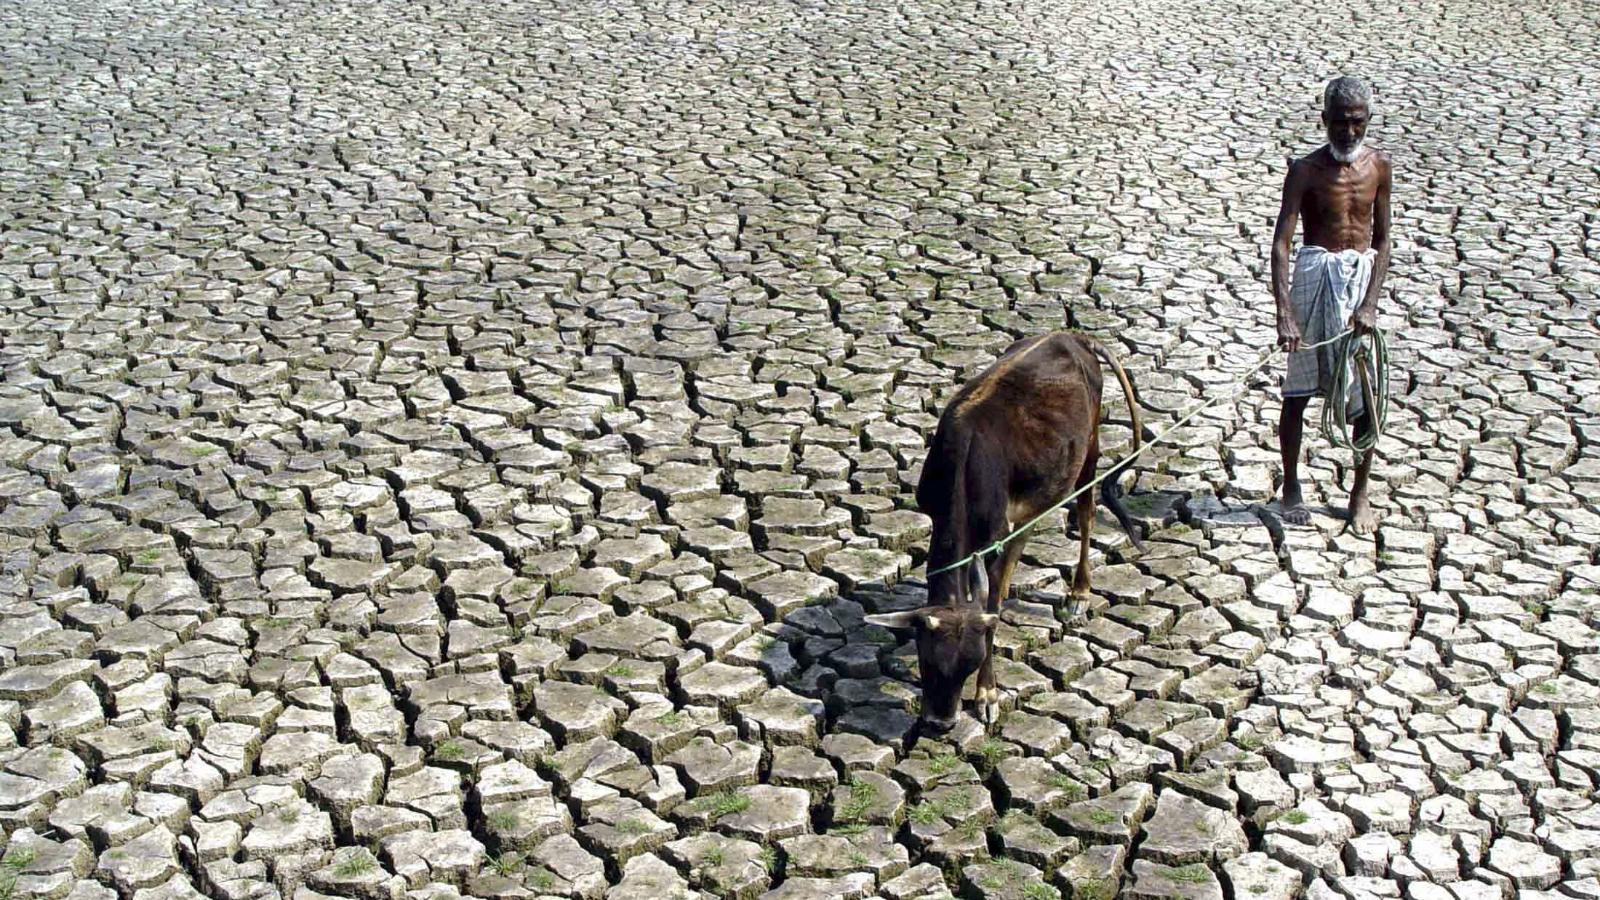 Water-Monsoon-Summer-Save water